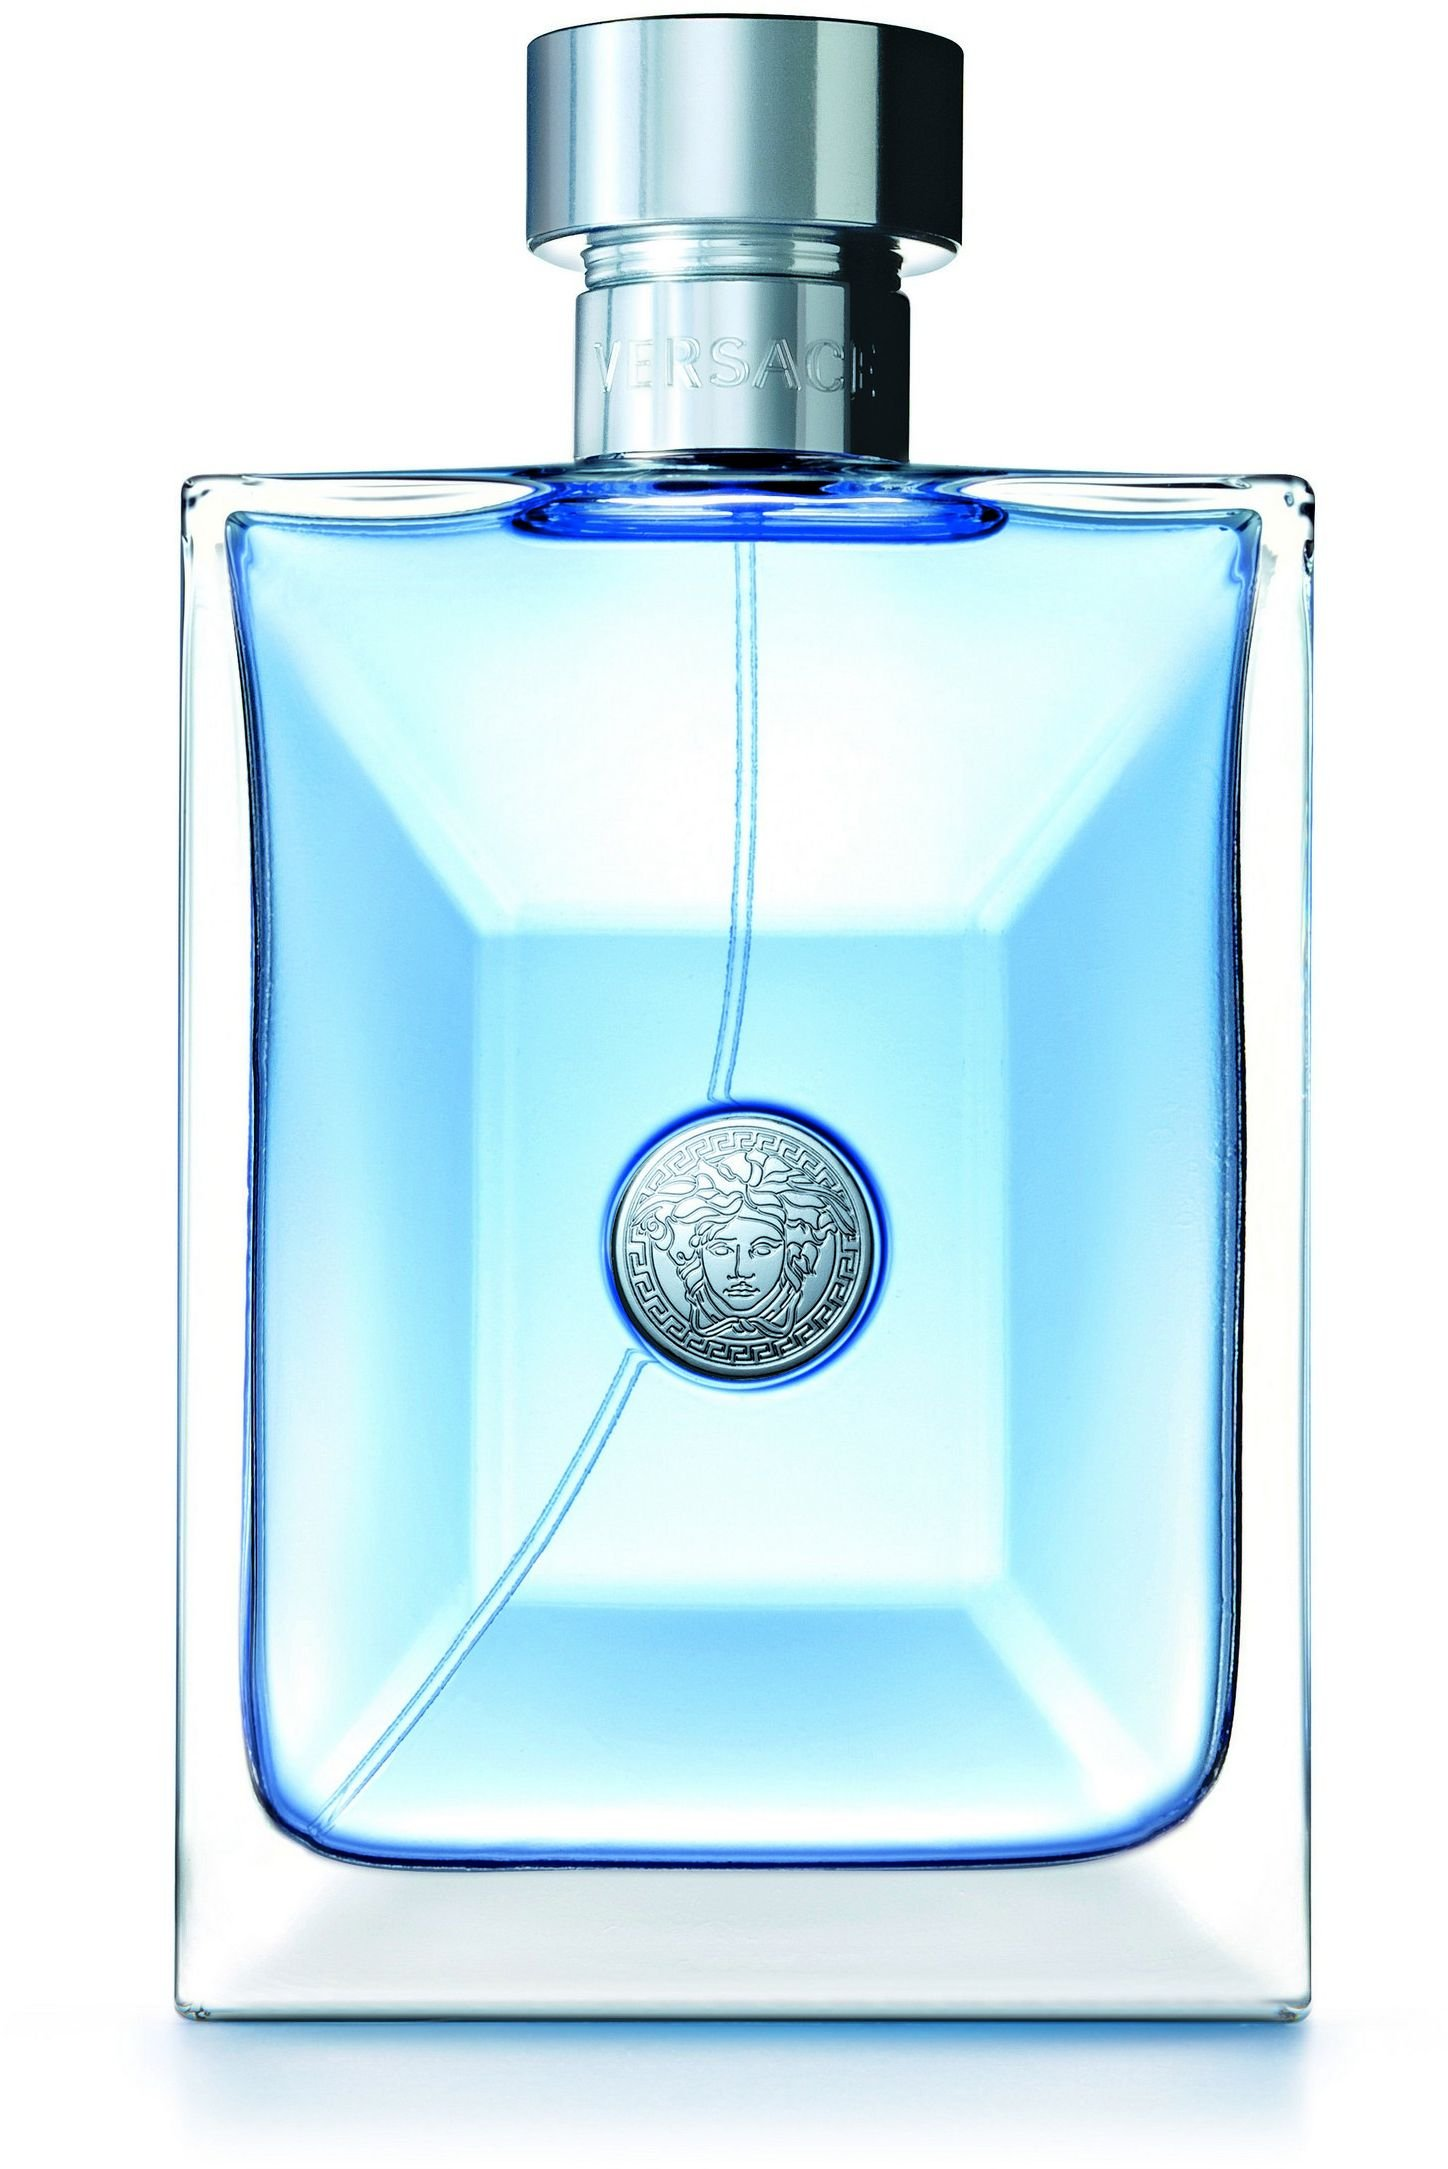 Cron de azzaro perfume precio amazon